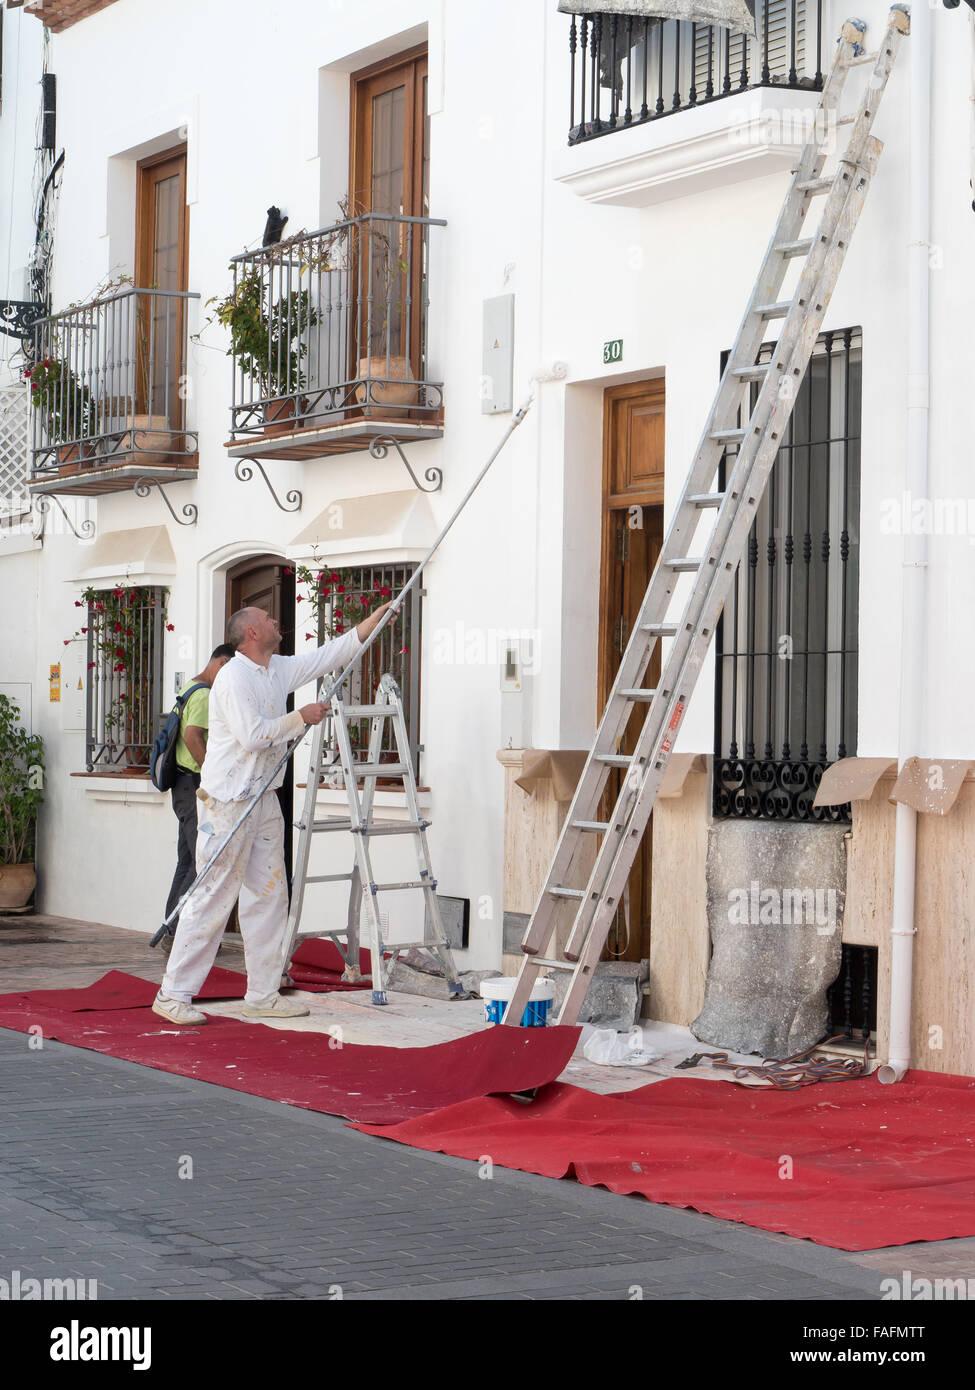 Decorator Whitewashing Outside of Building, Nerja, Costa Del Sol, Spain, - Stock Image